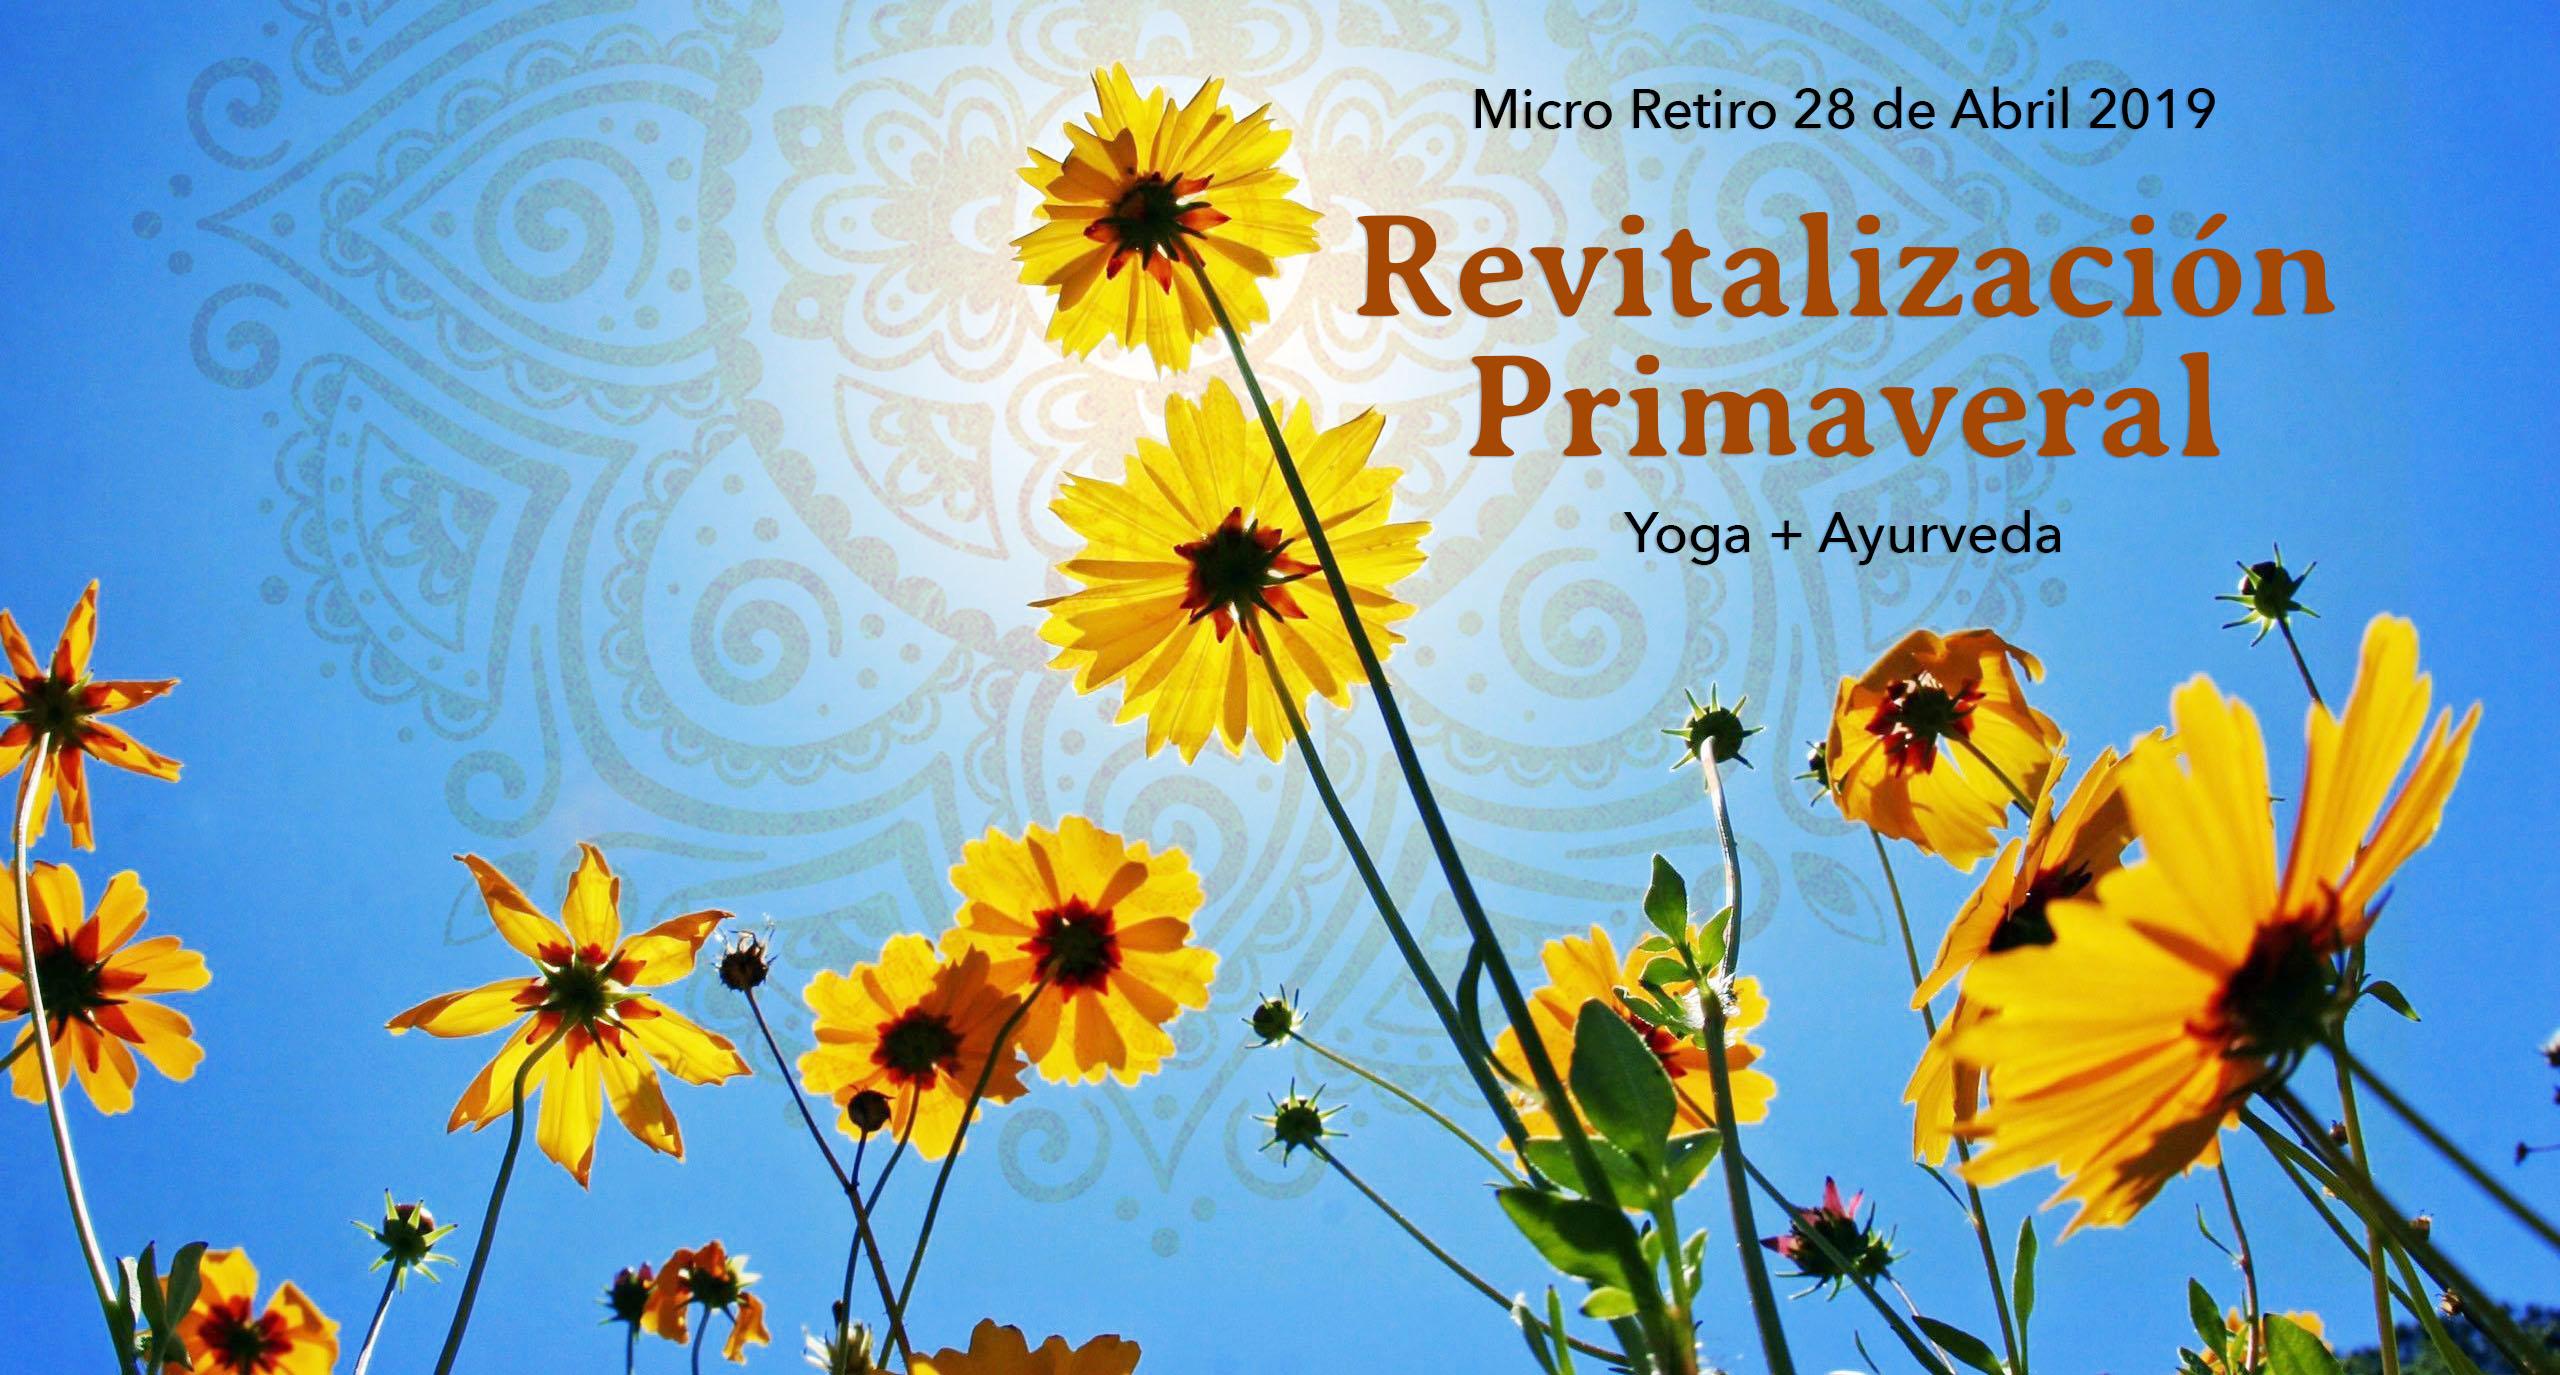 RevitalizaciónPrimaveral: Yoga & Ayurveda